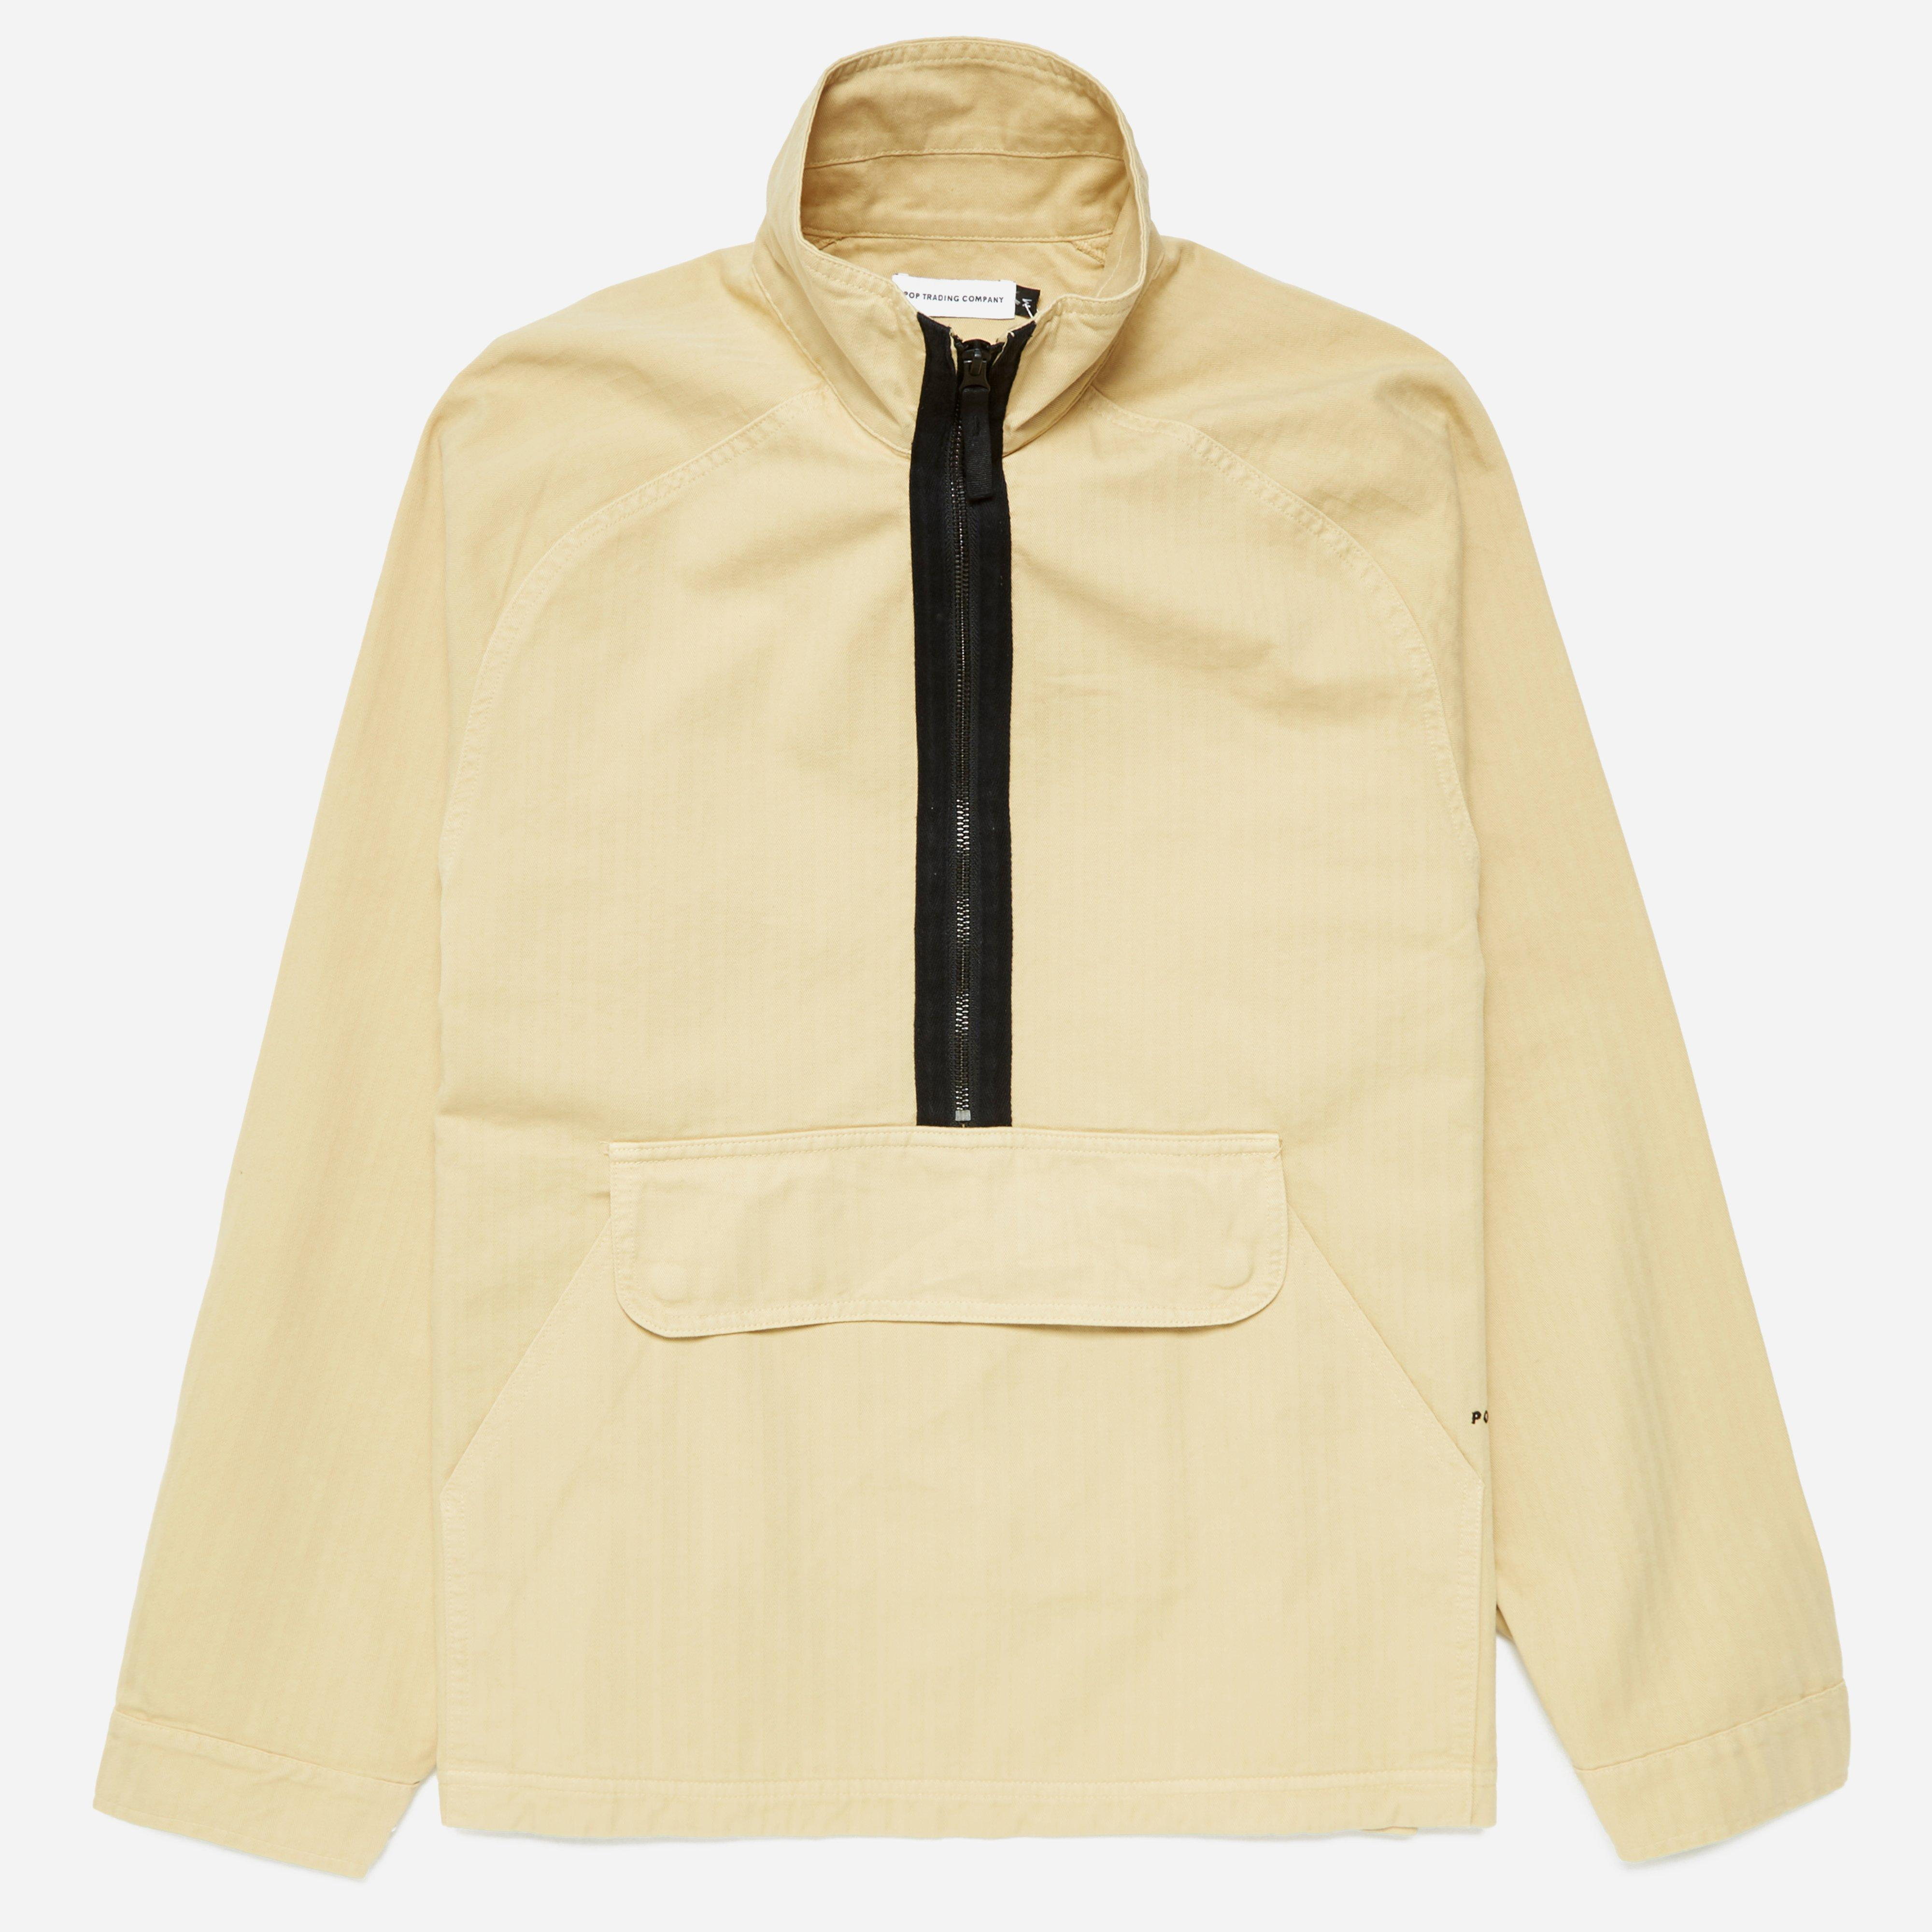 Pop Trading Company Drs Half Zip Jacket